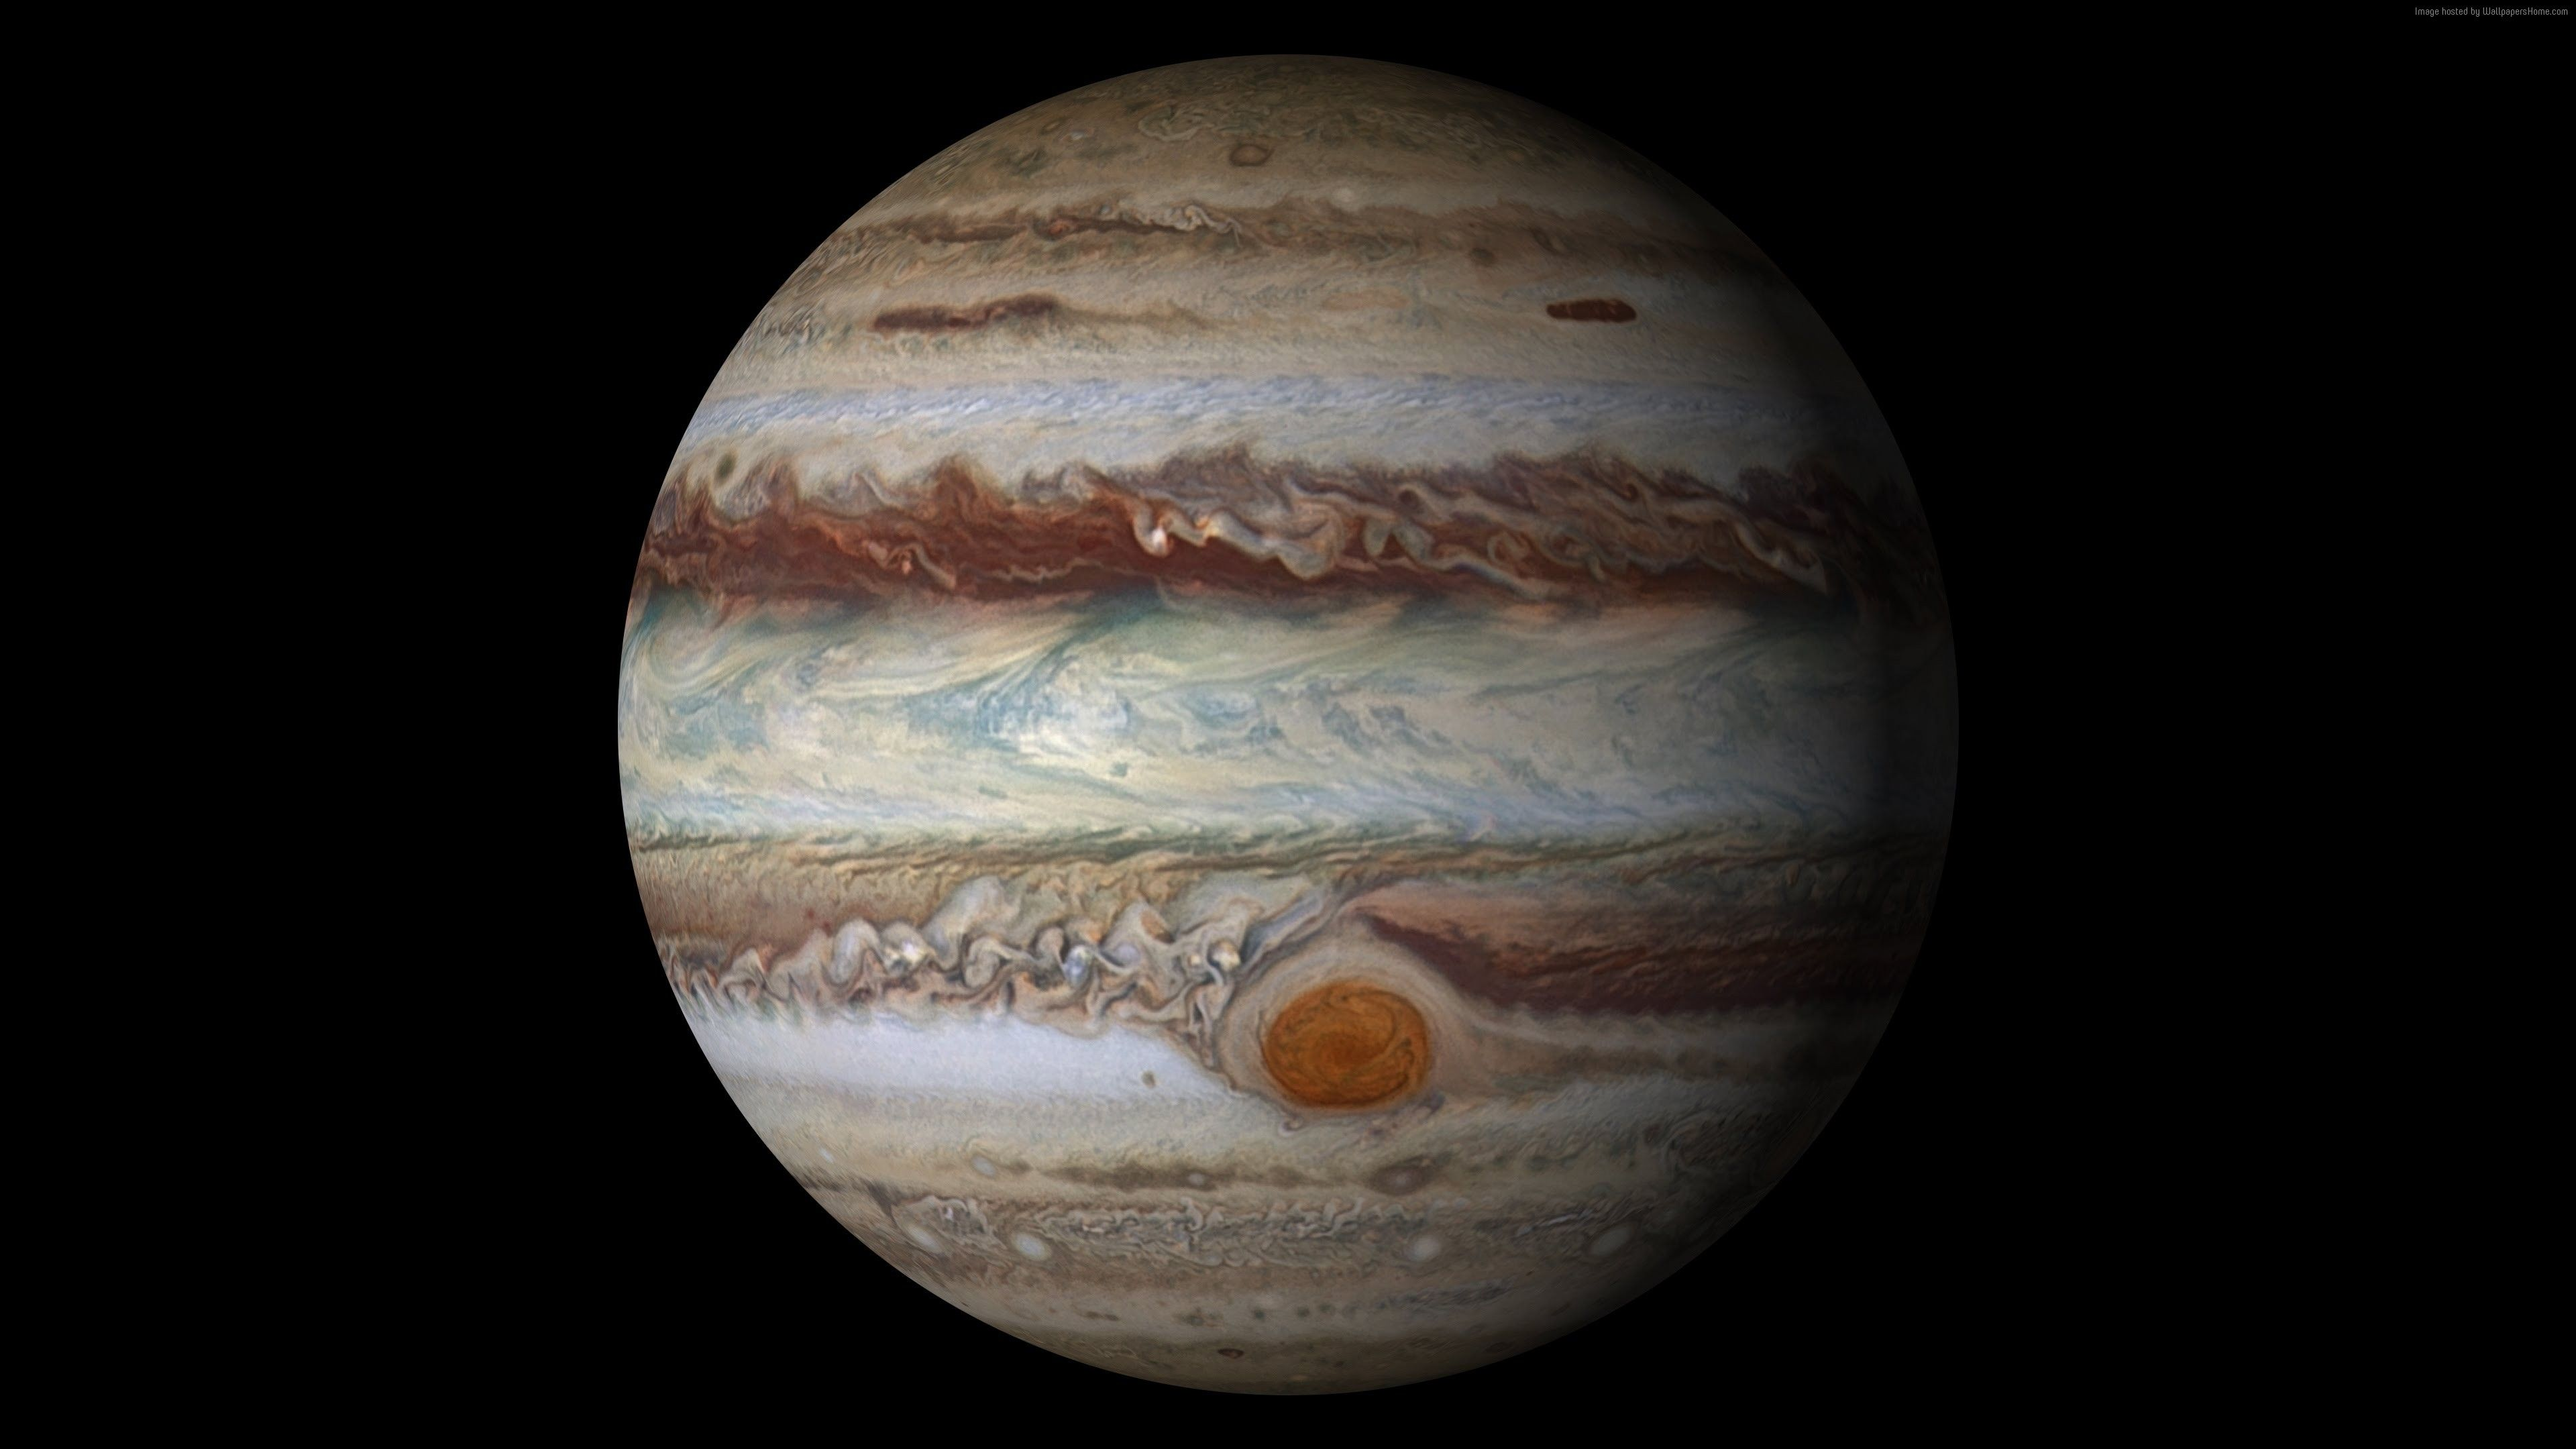 Wallpaper Jupiter Juno 4k Hd Nasa Space Photo Planet Space Http Www Wallpaperback Net Space Wallpaper Jupite Jupiter Wallpaper Jupiter Planet Planets